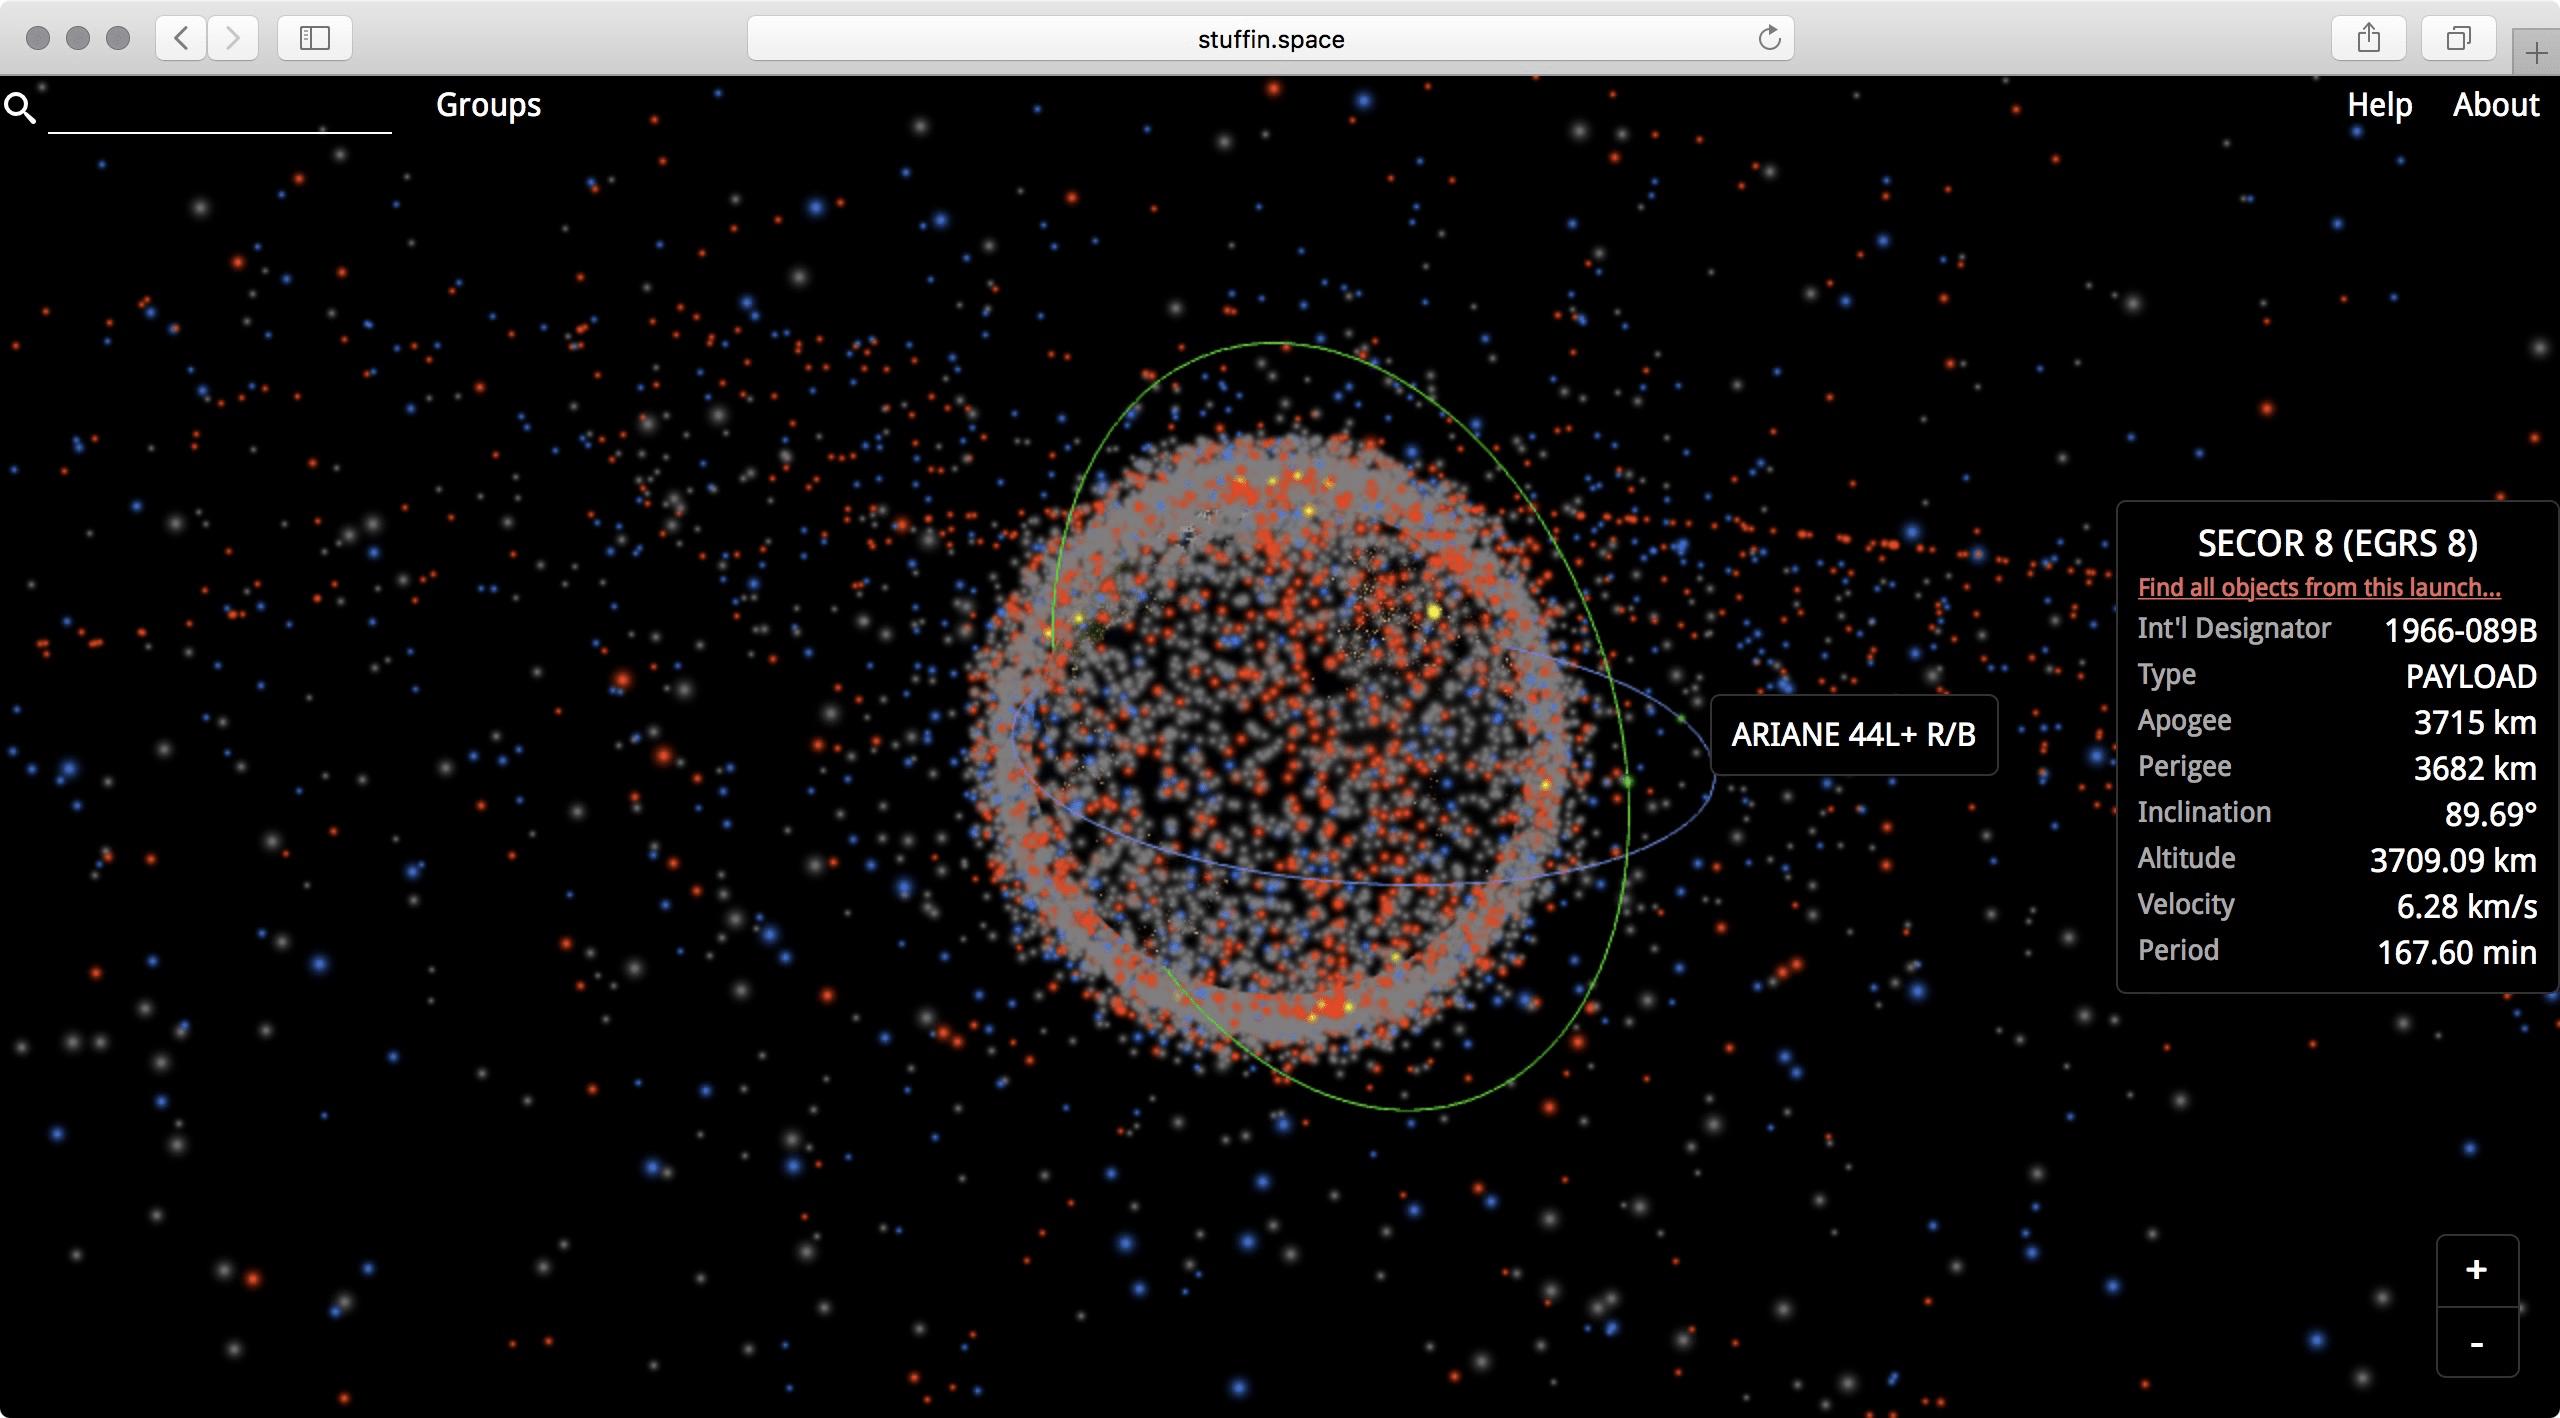 LinkTipp: Stuff in Space